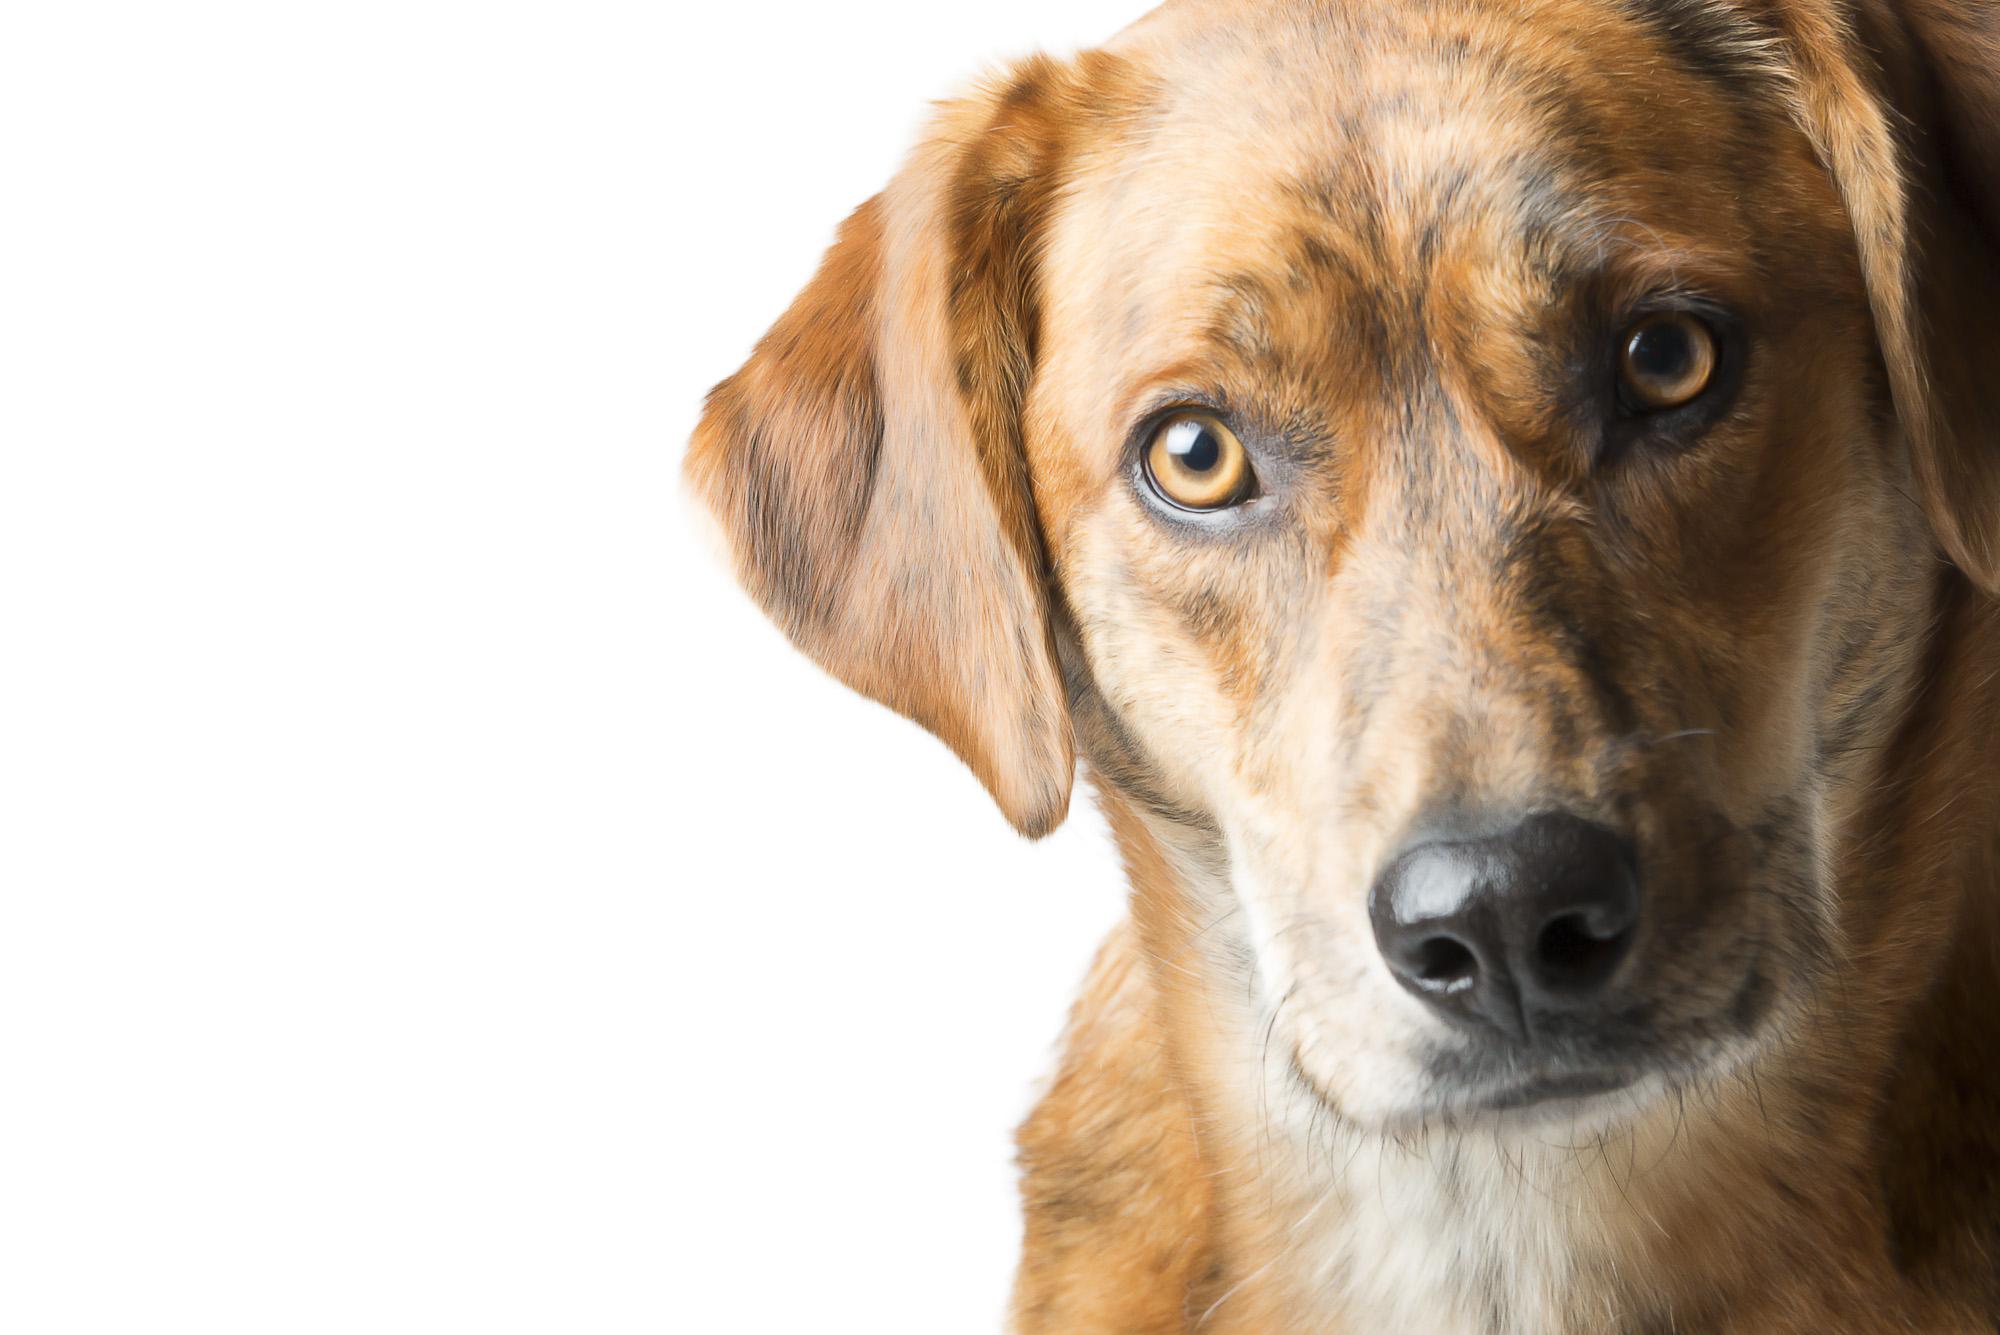 LupinBay-0127-Dog-Pet-Photography-2461.jpg